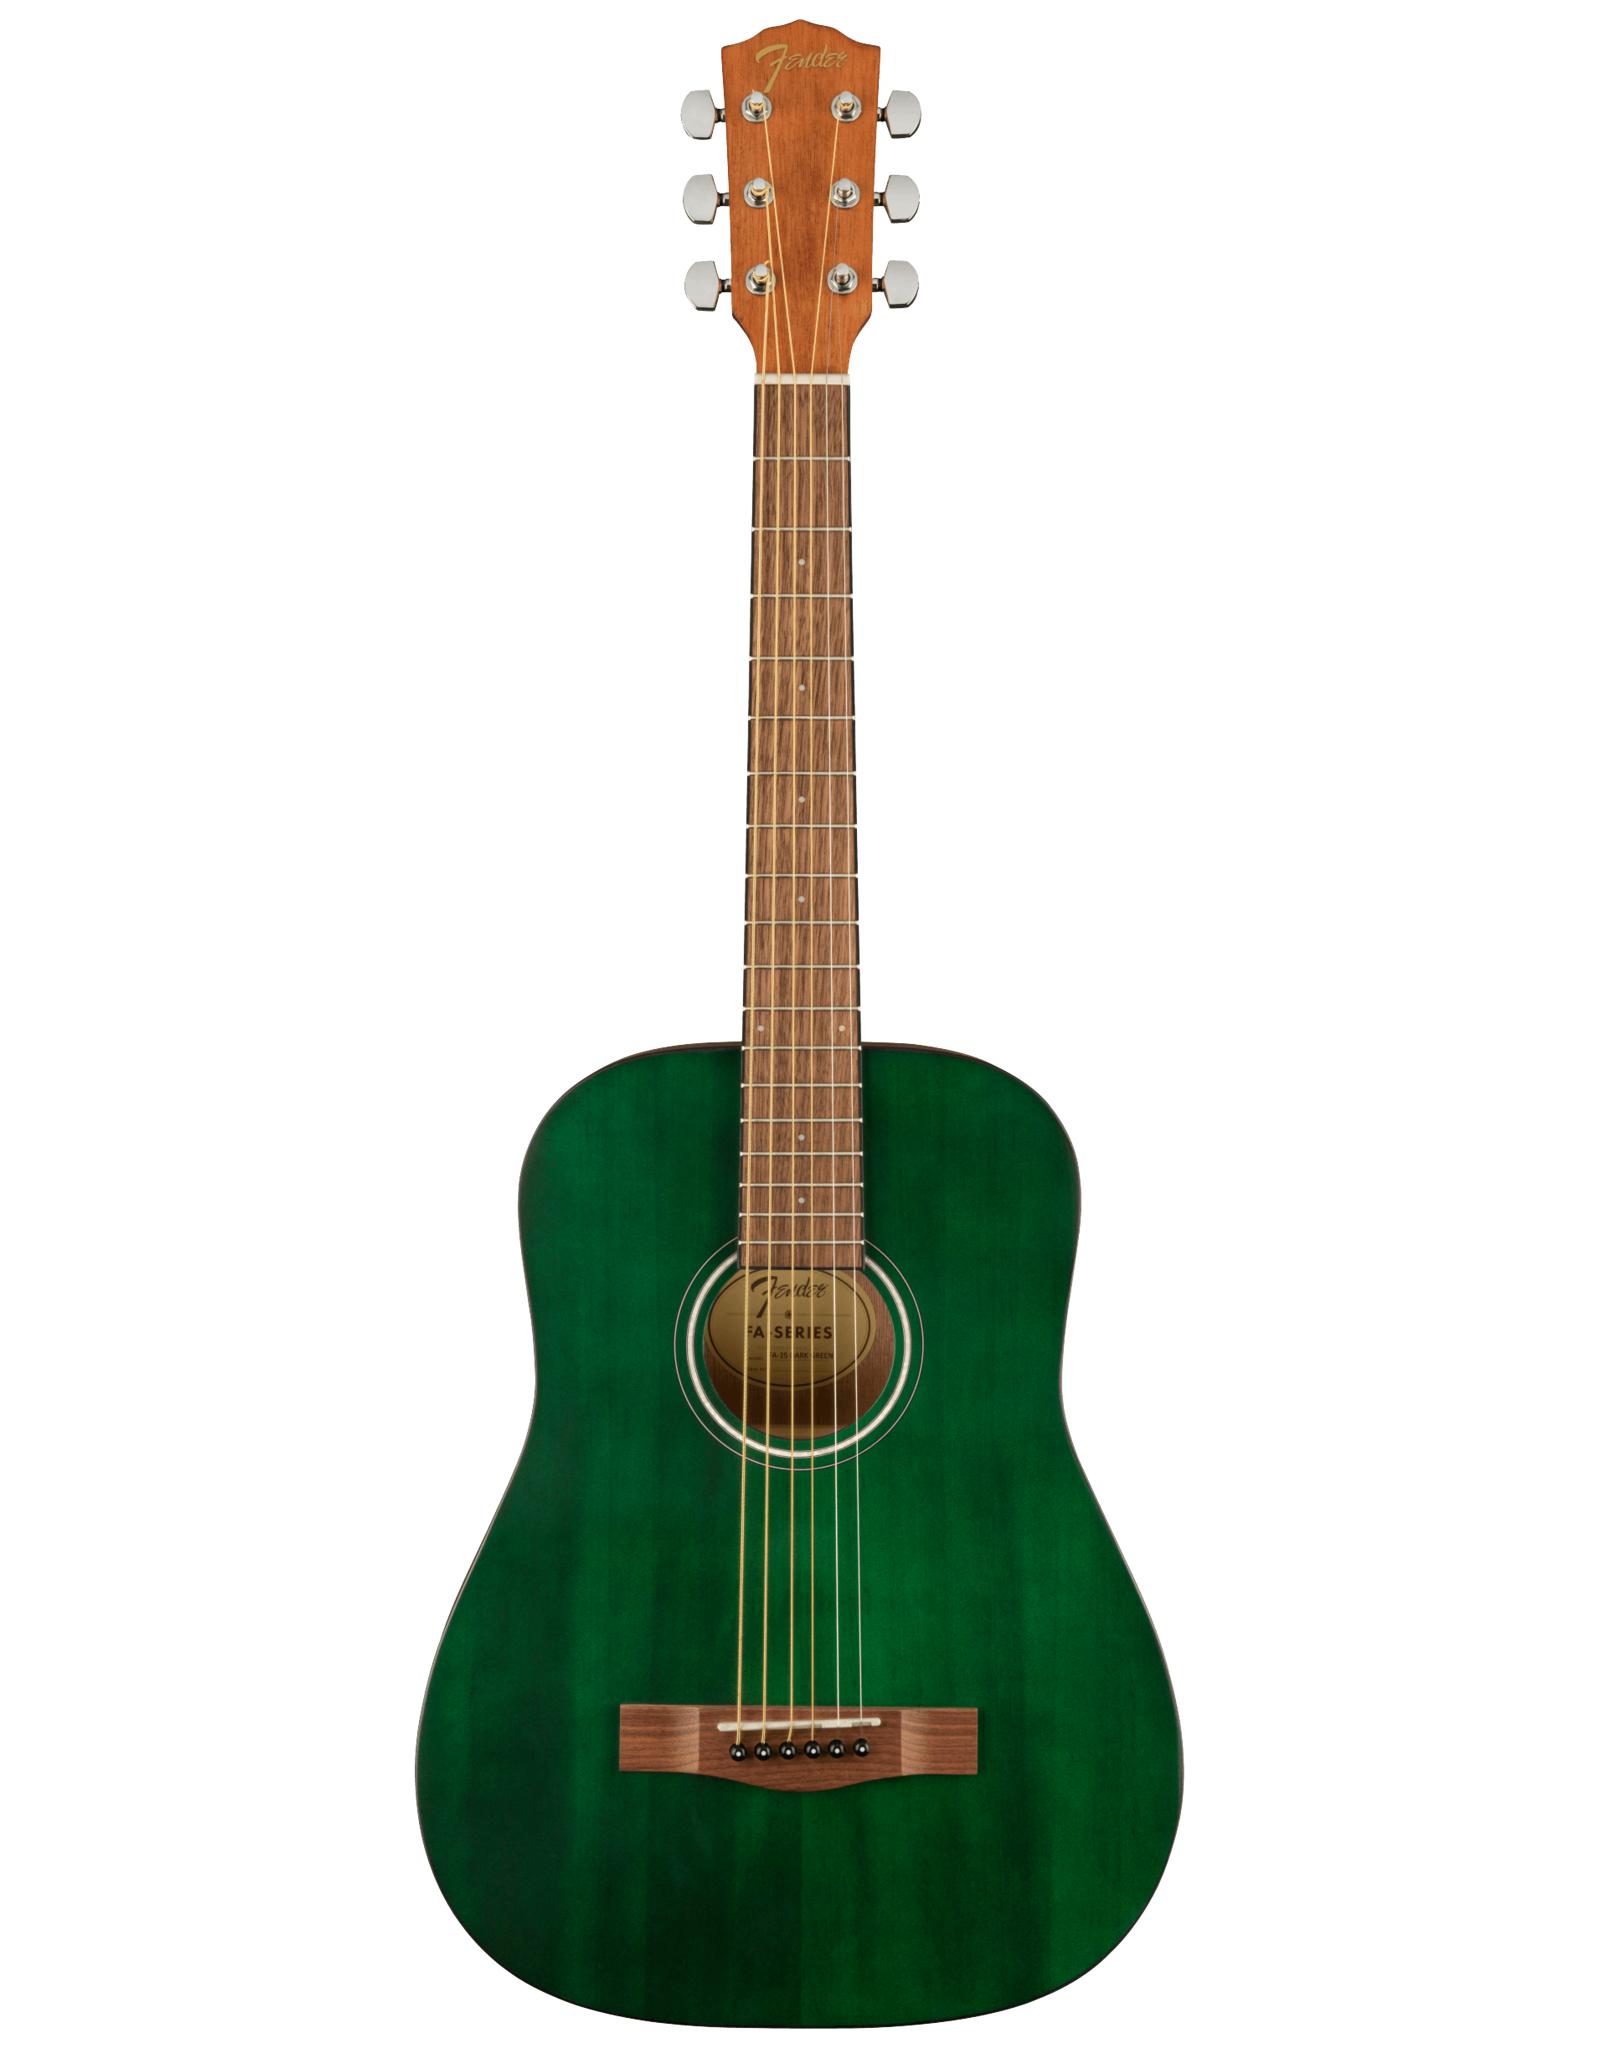 Fender Fender FA-15 3/4 Scale Acoustic Guitar, Green w/gig bag